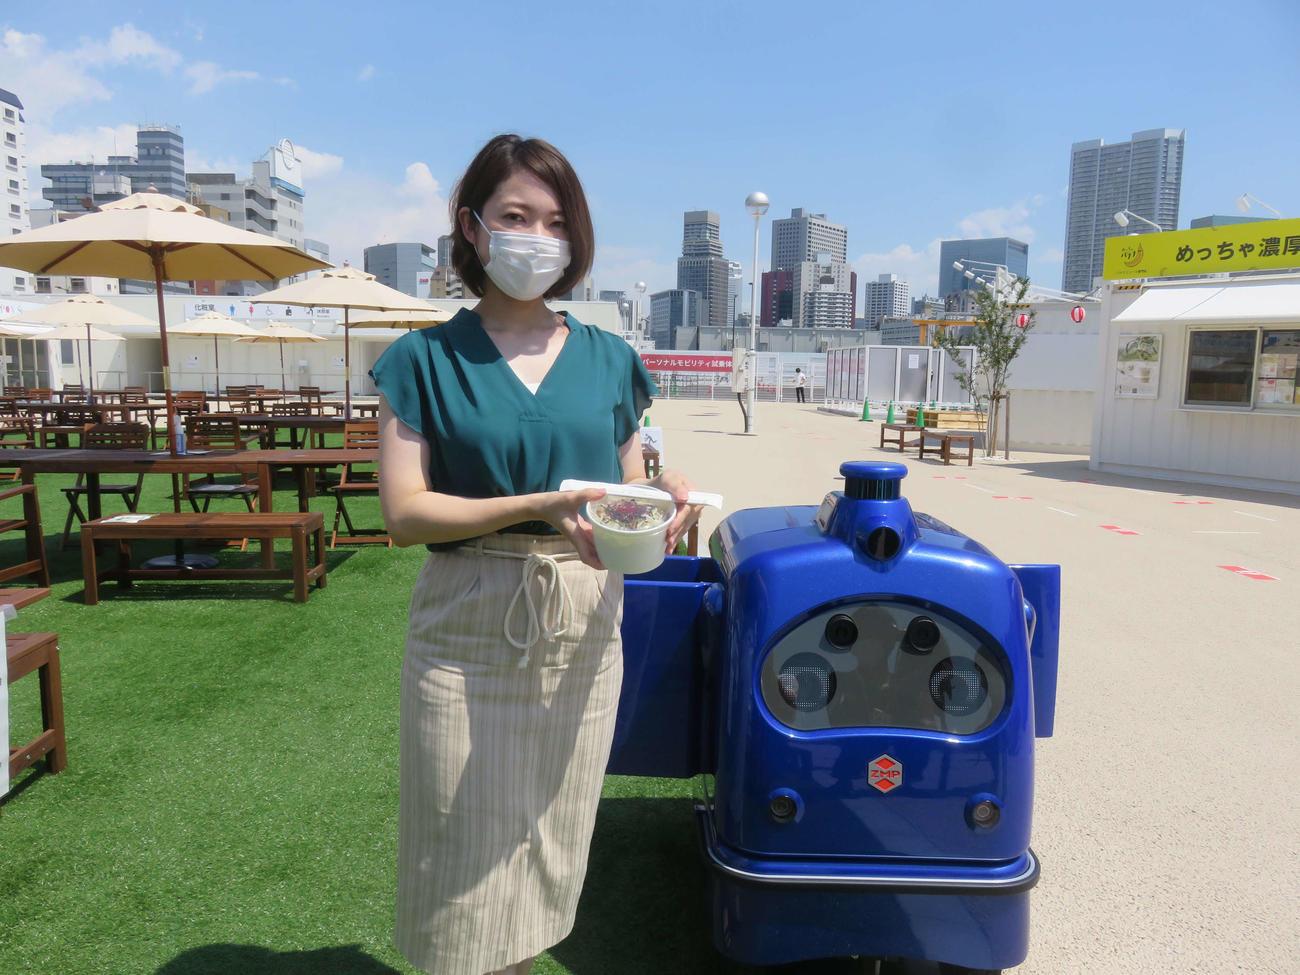 JR高輪ゲートウェイ駅前の特設会場で自動運転ロボット「デリロ」が出前の実証実験を行った(撮影・大上悟)